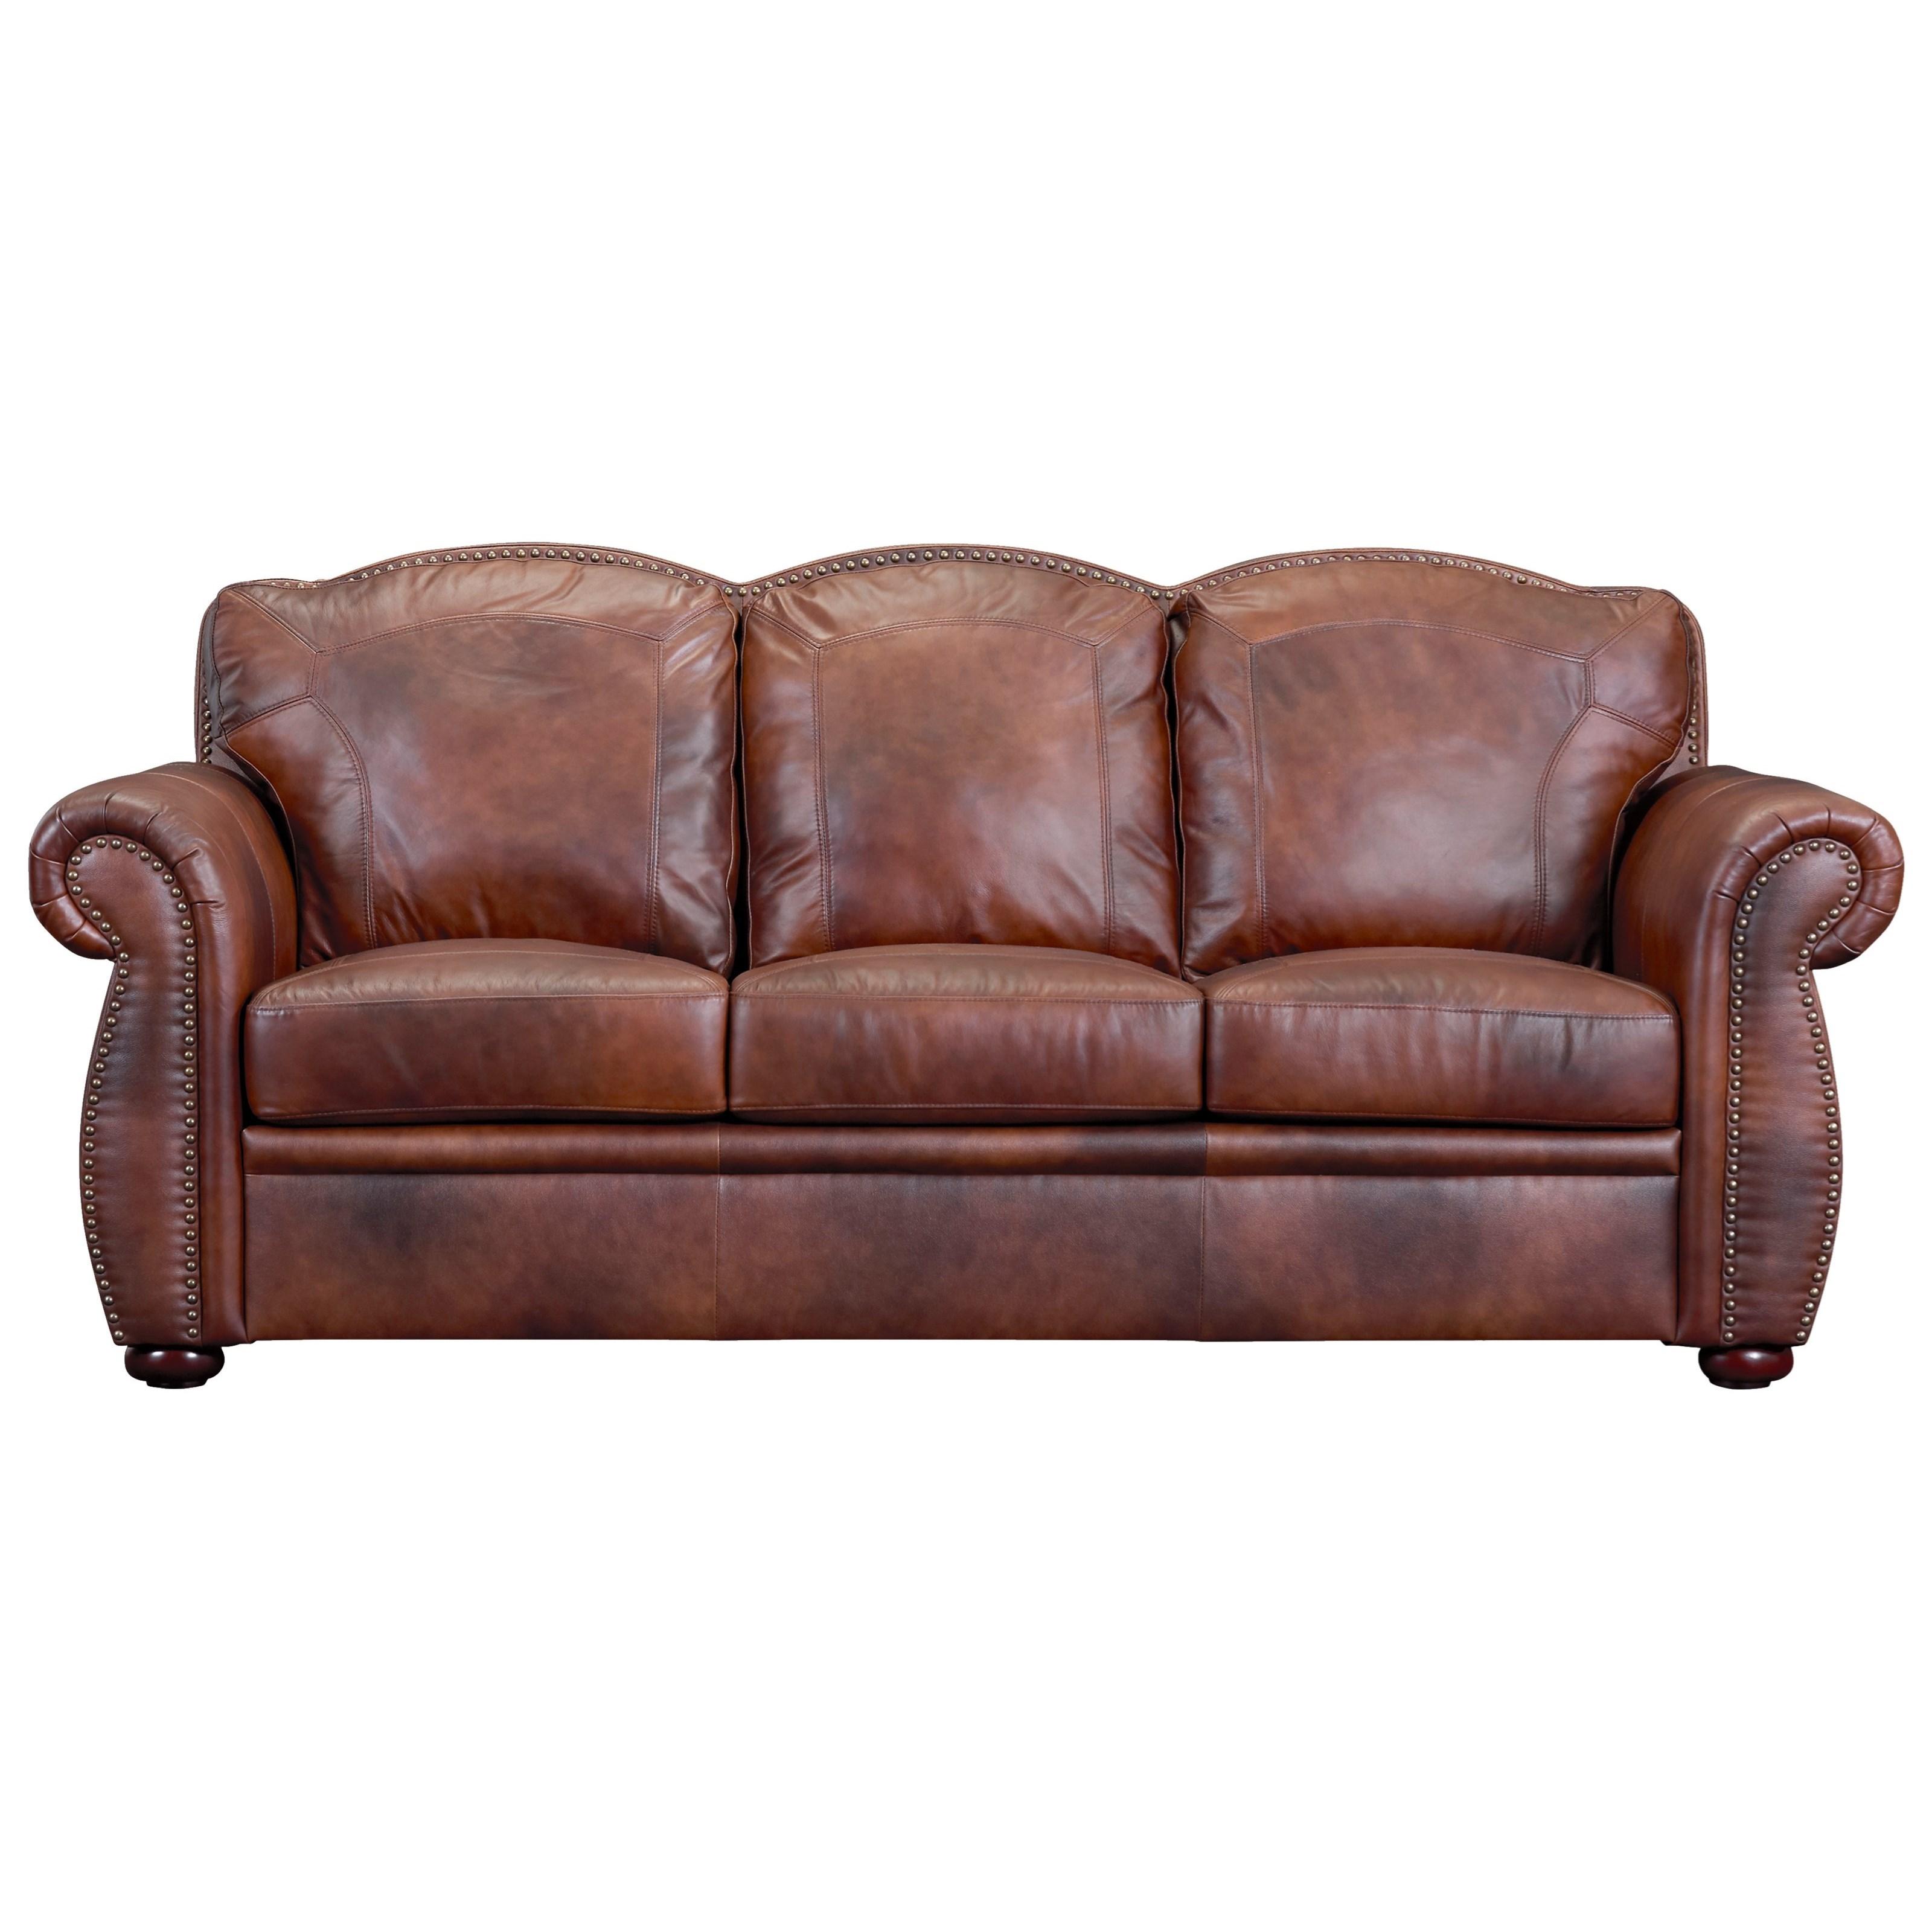 Superieur Fashion Furniture